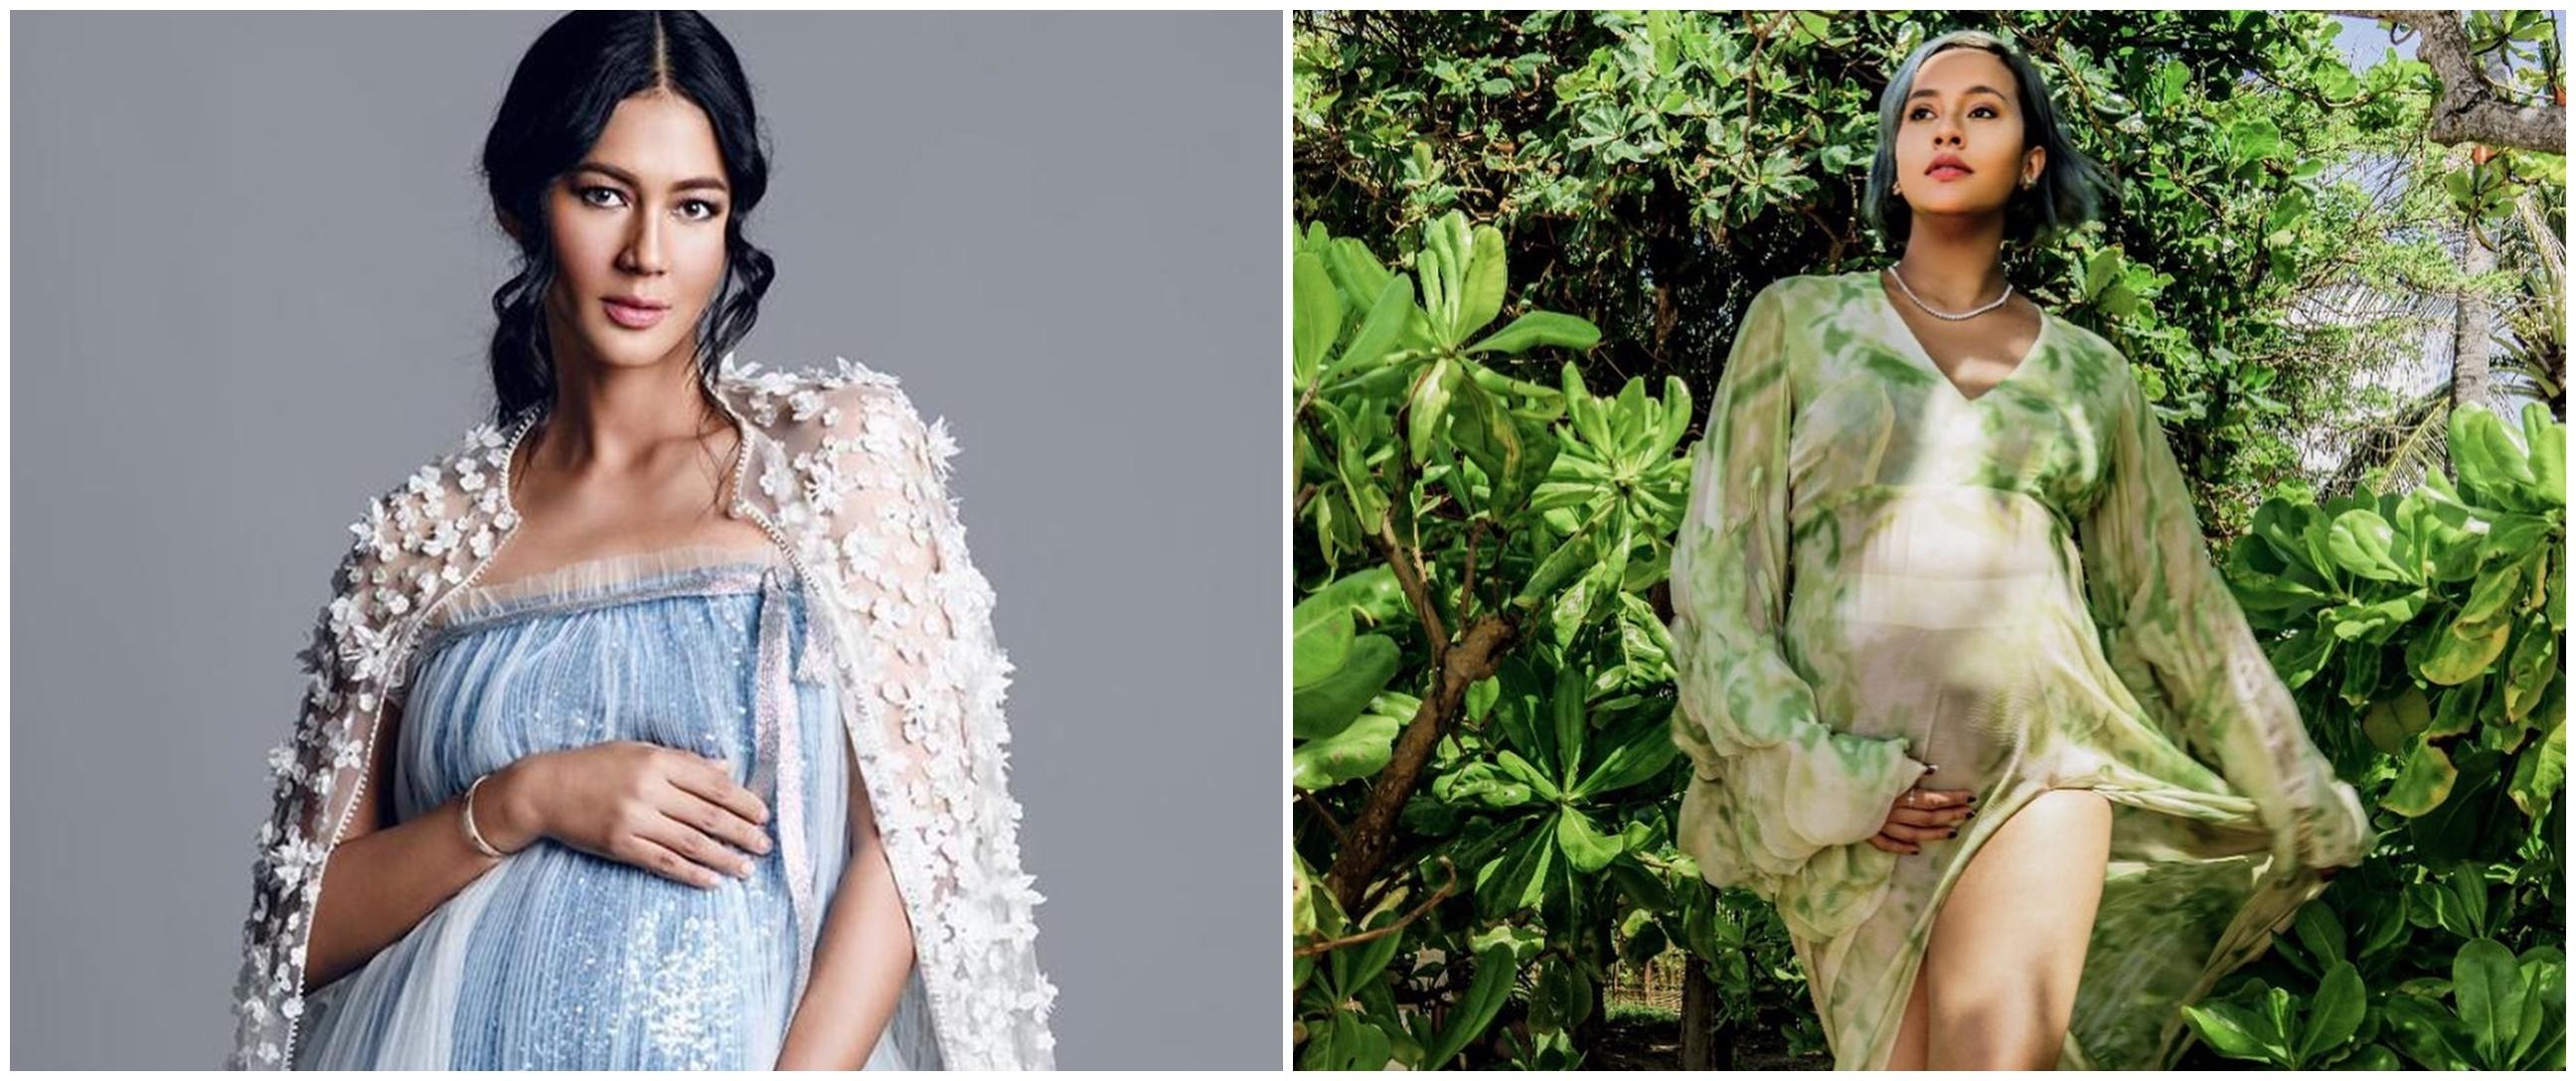 Gaya pemotretan maternity 5 supermodel Indonesia, elegan dan memesona